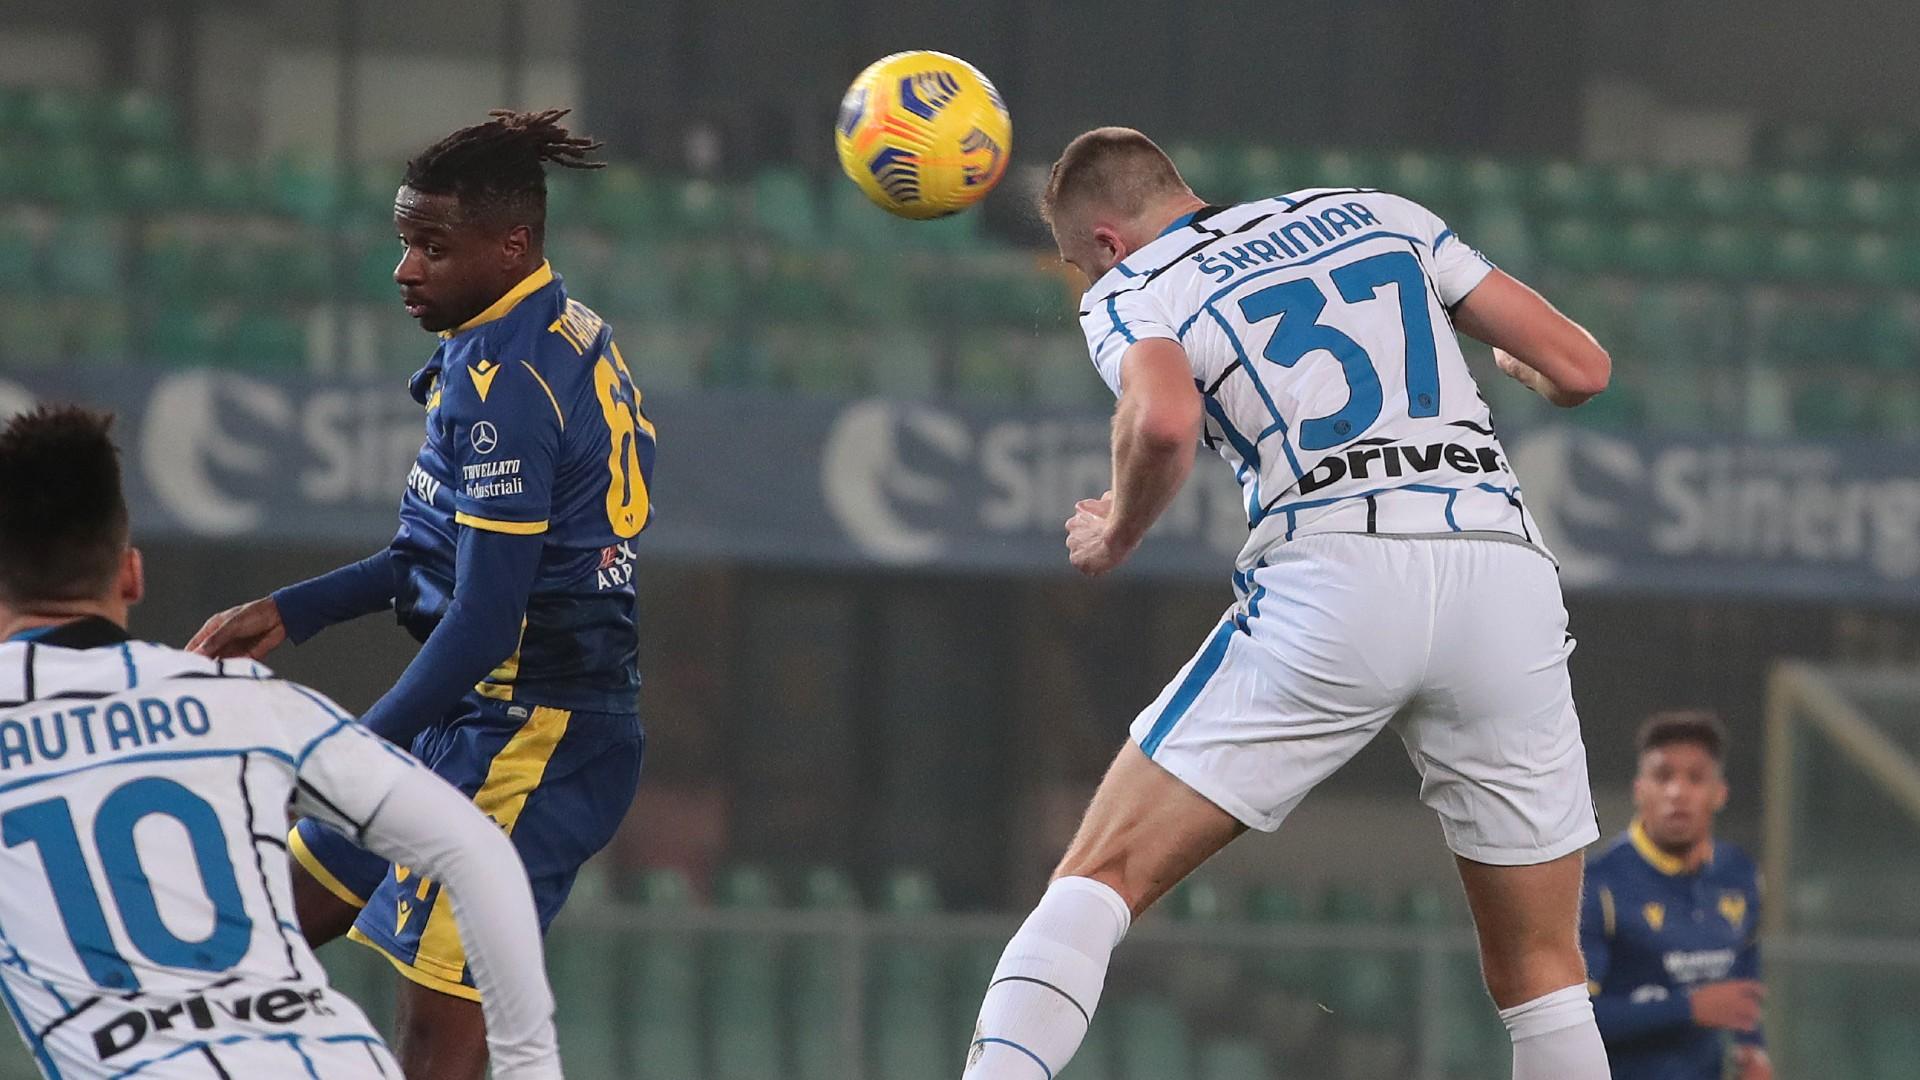 Hellas Verona 1-2 Inter: Skriniar secures seventh straight success